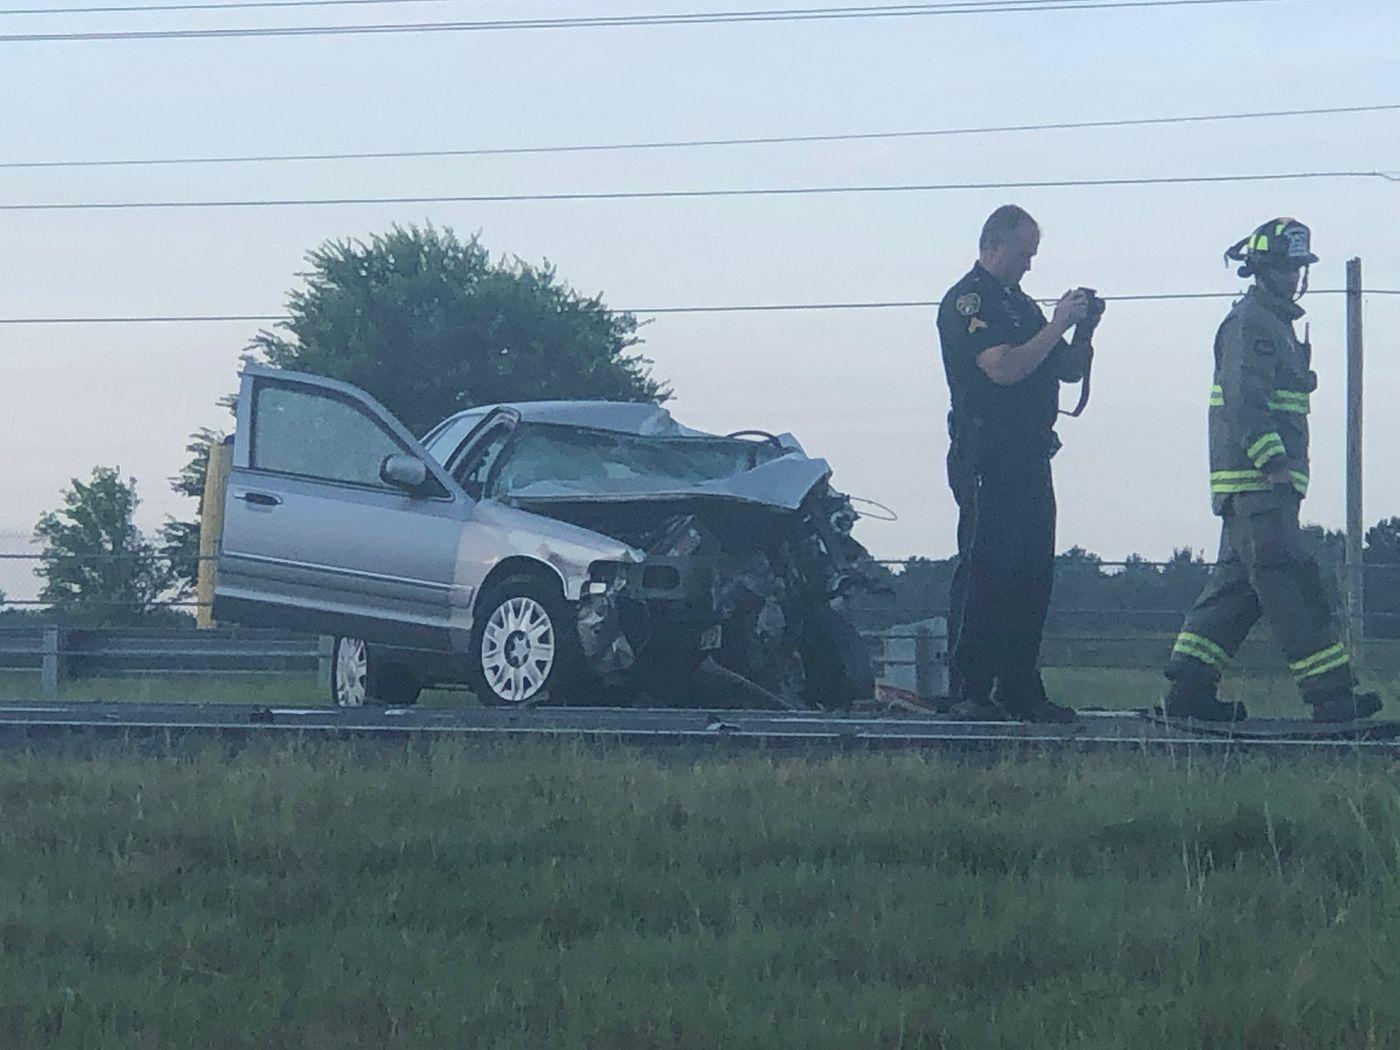 1 killed in 3-vehicle crash Saturday morning on I-85